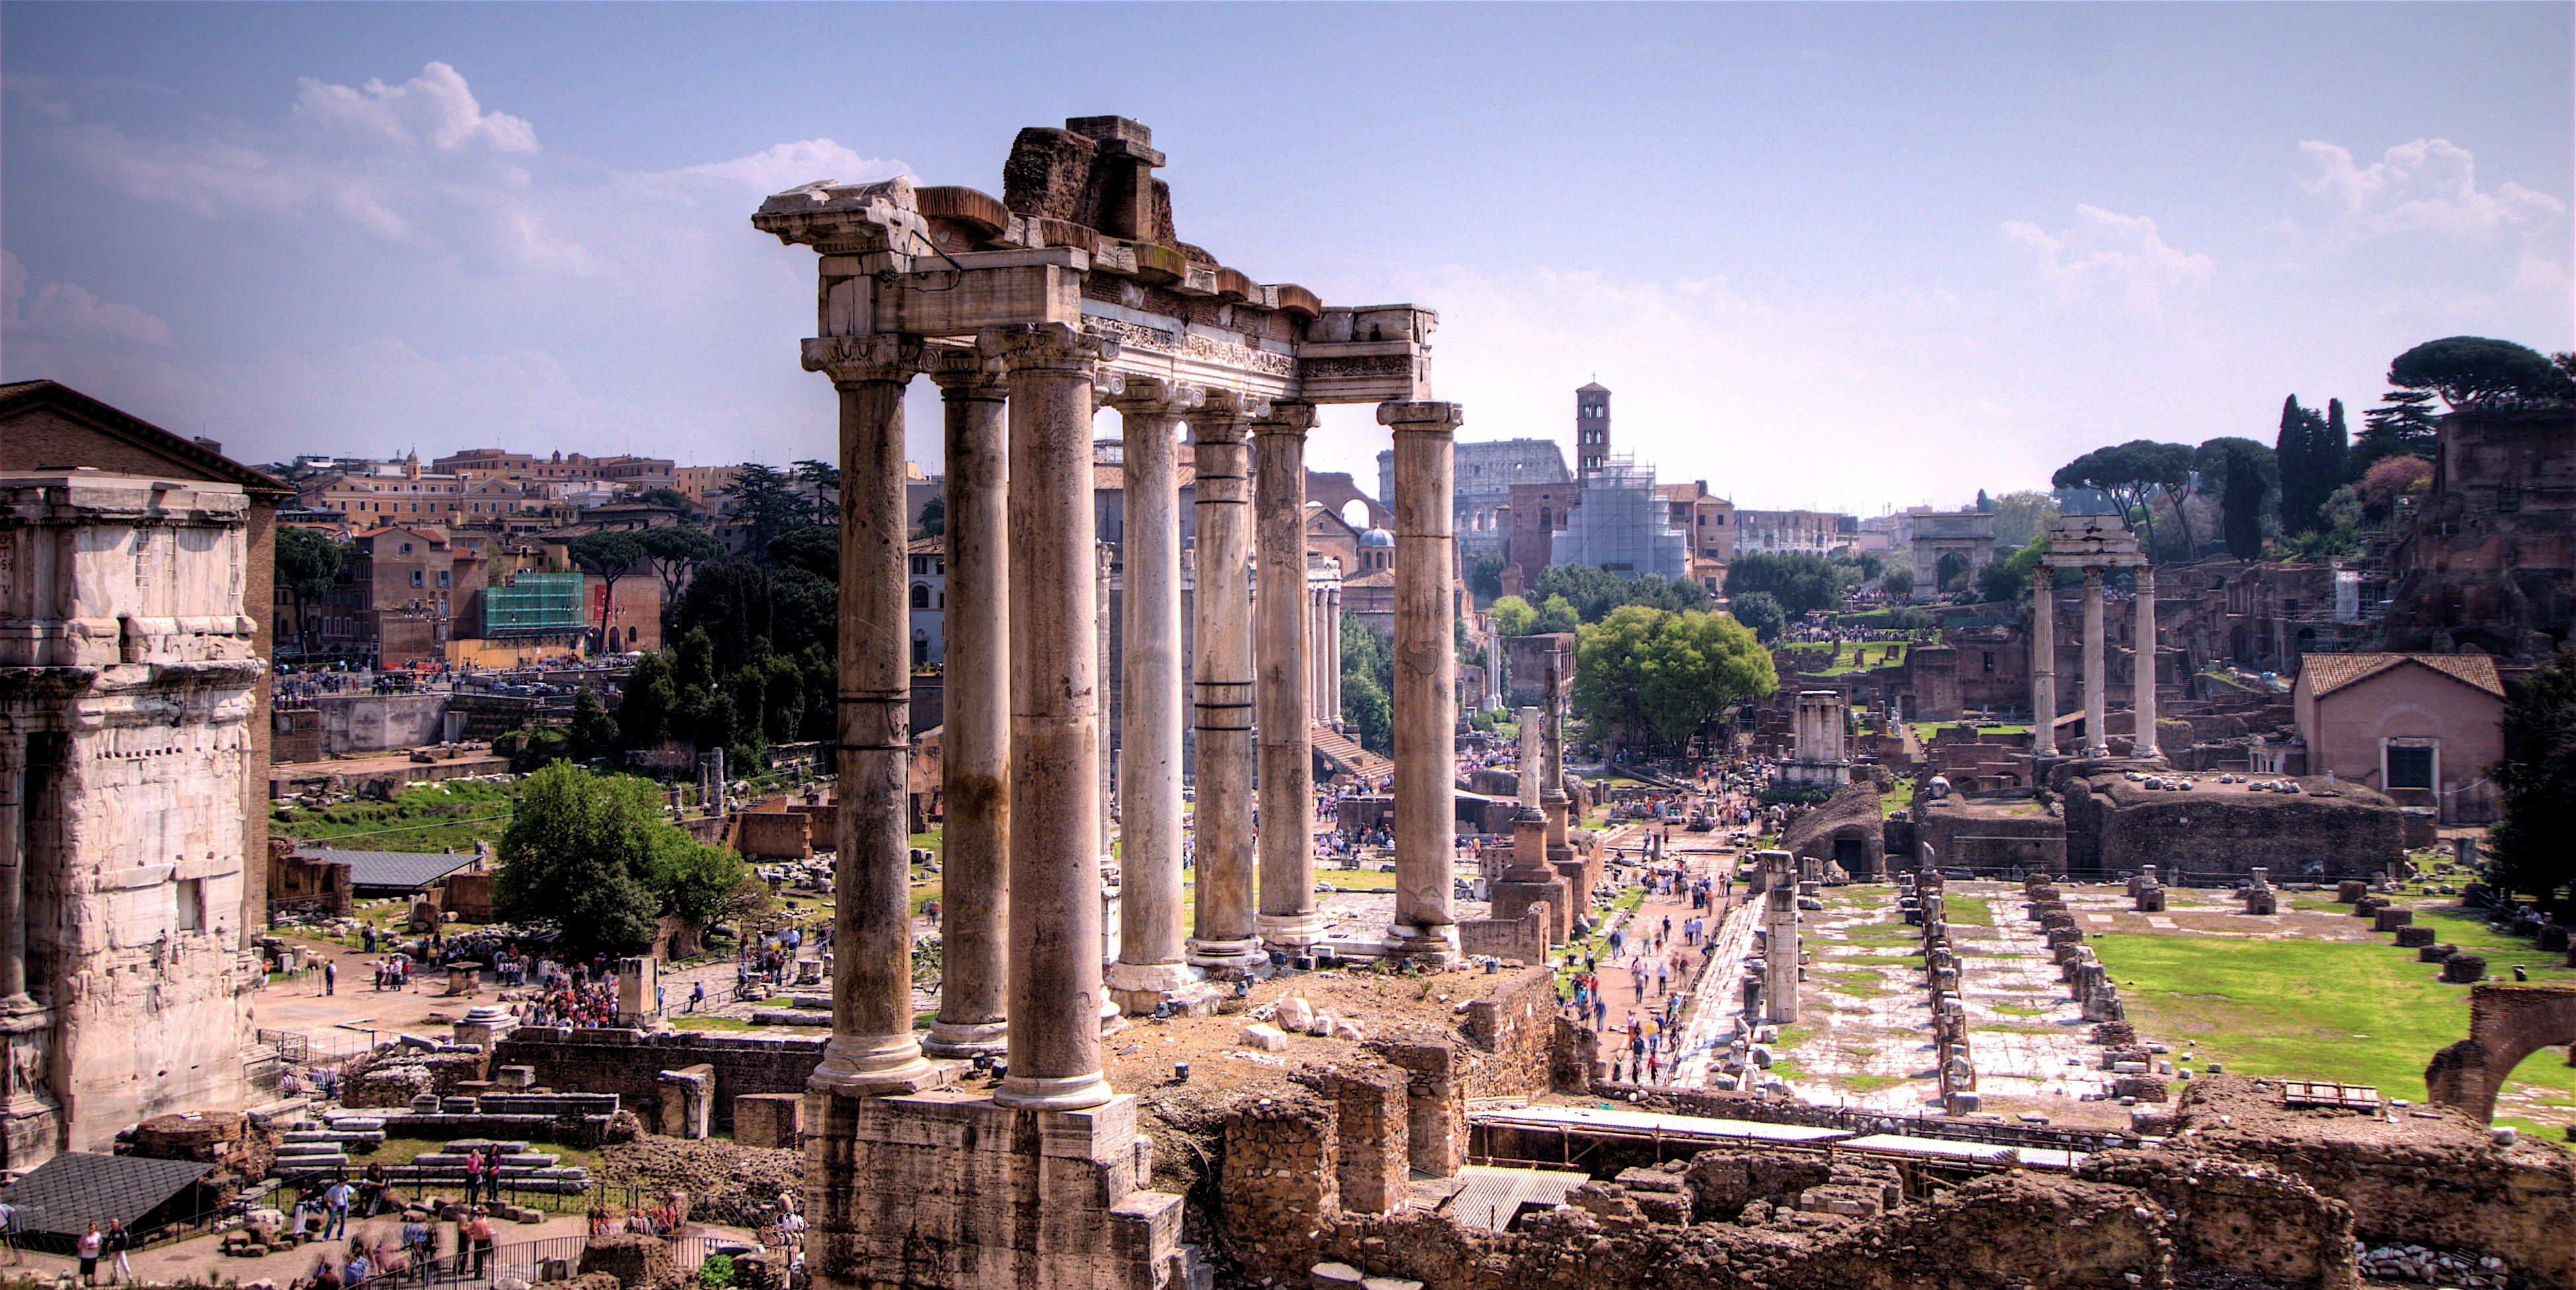 Forum romanum illustration ancient history encyclopedia